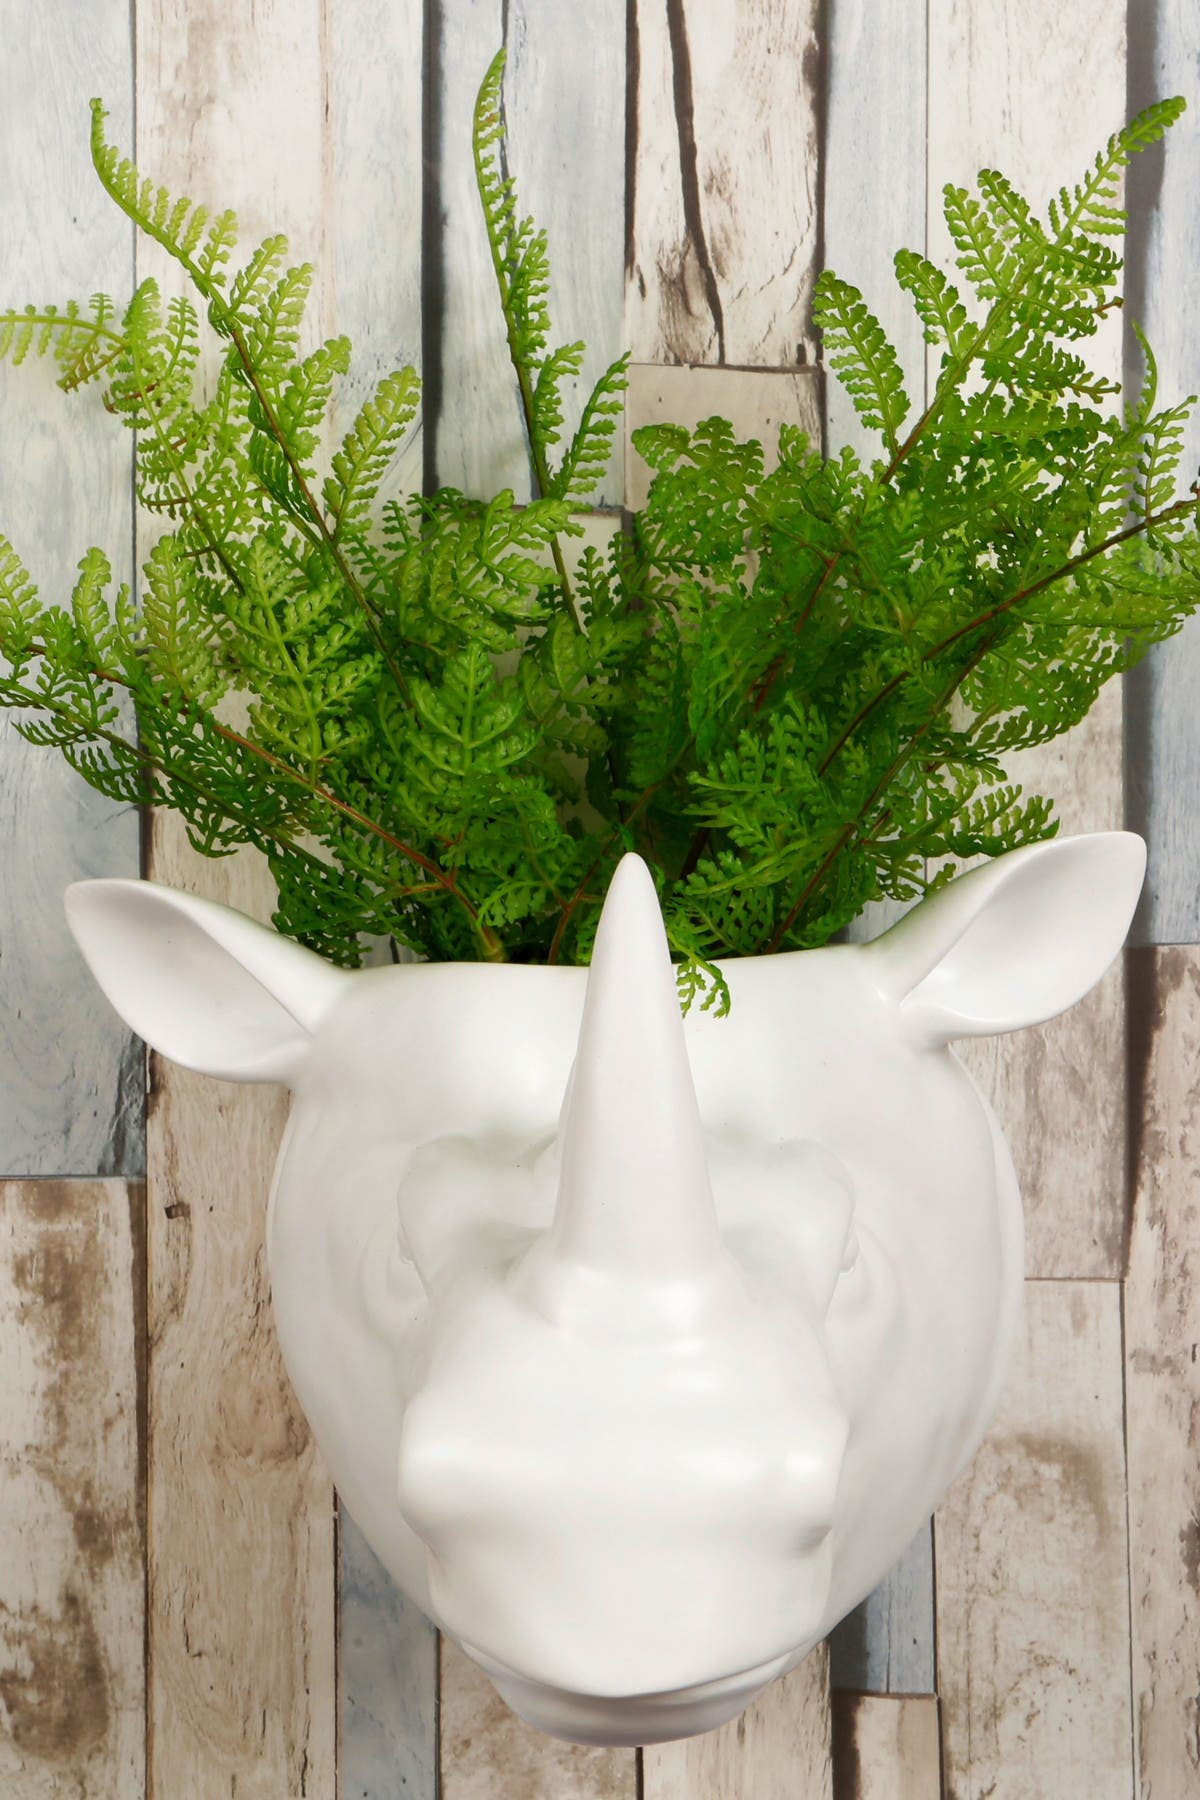 Image of WalPlus 2-in-1 White Faux Taxidermy White Rhino Pot Wall Art